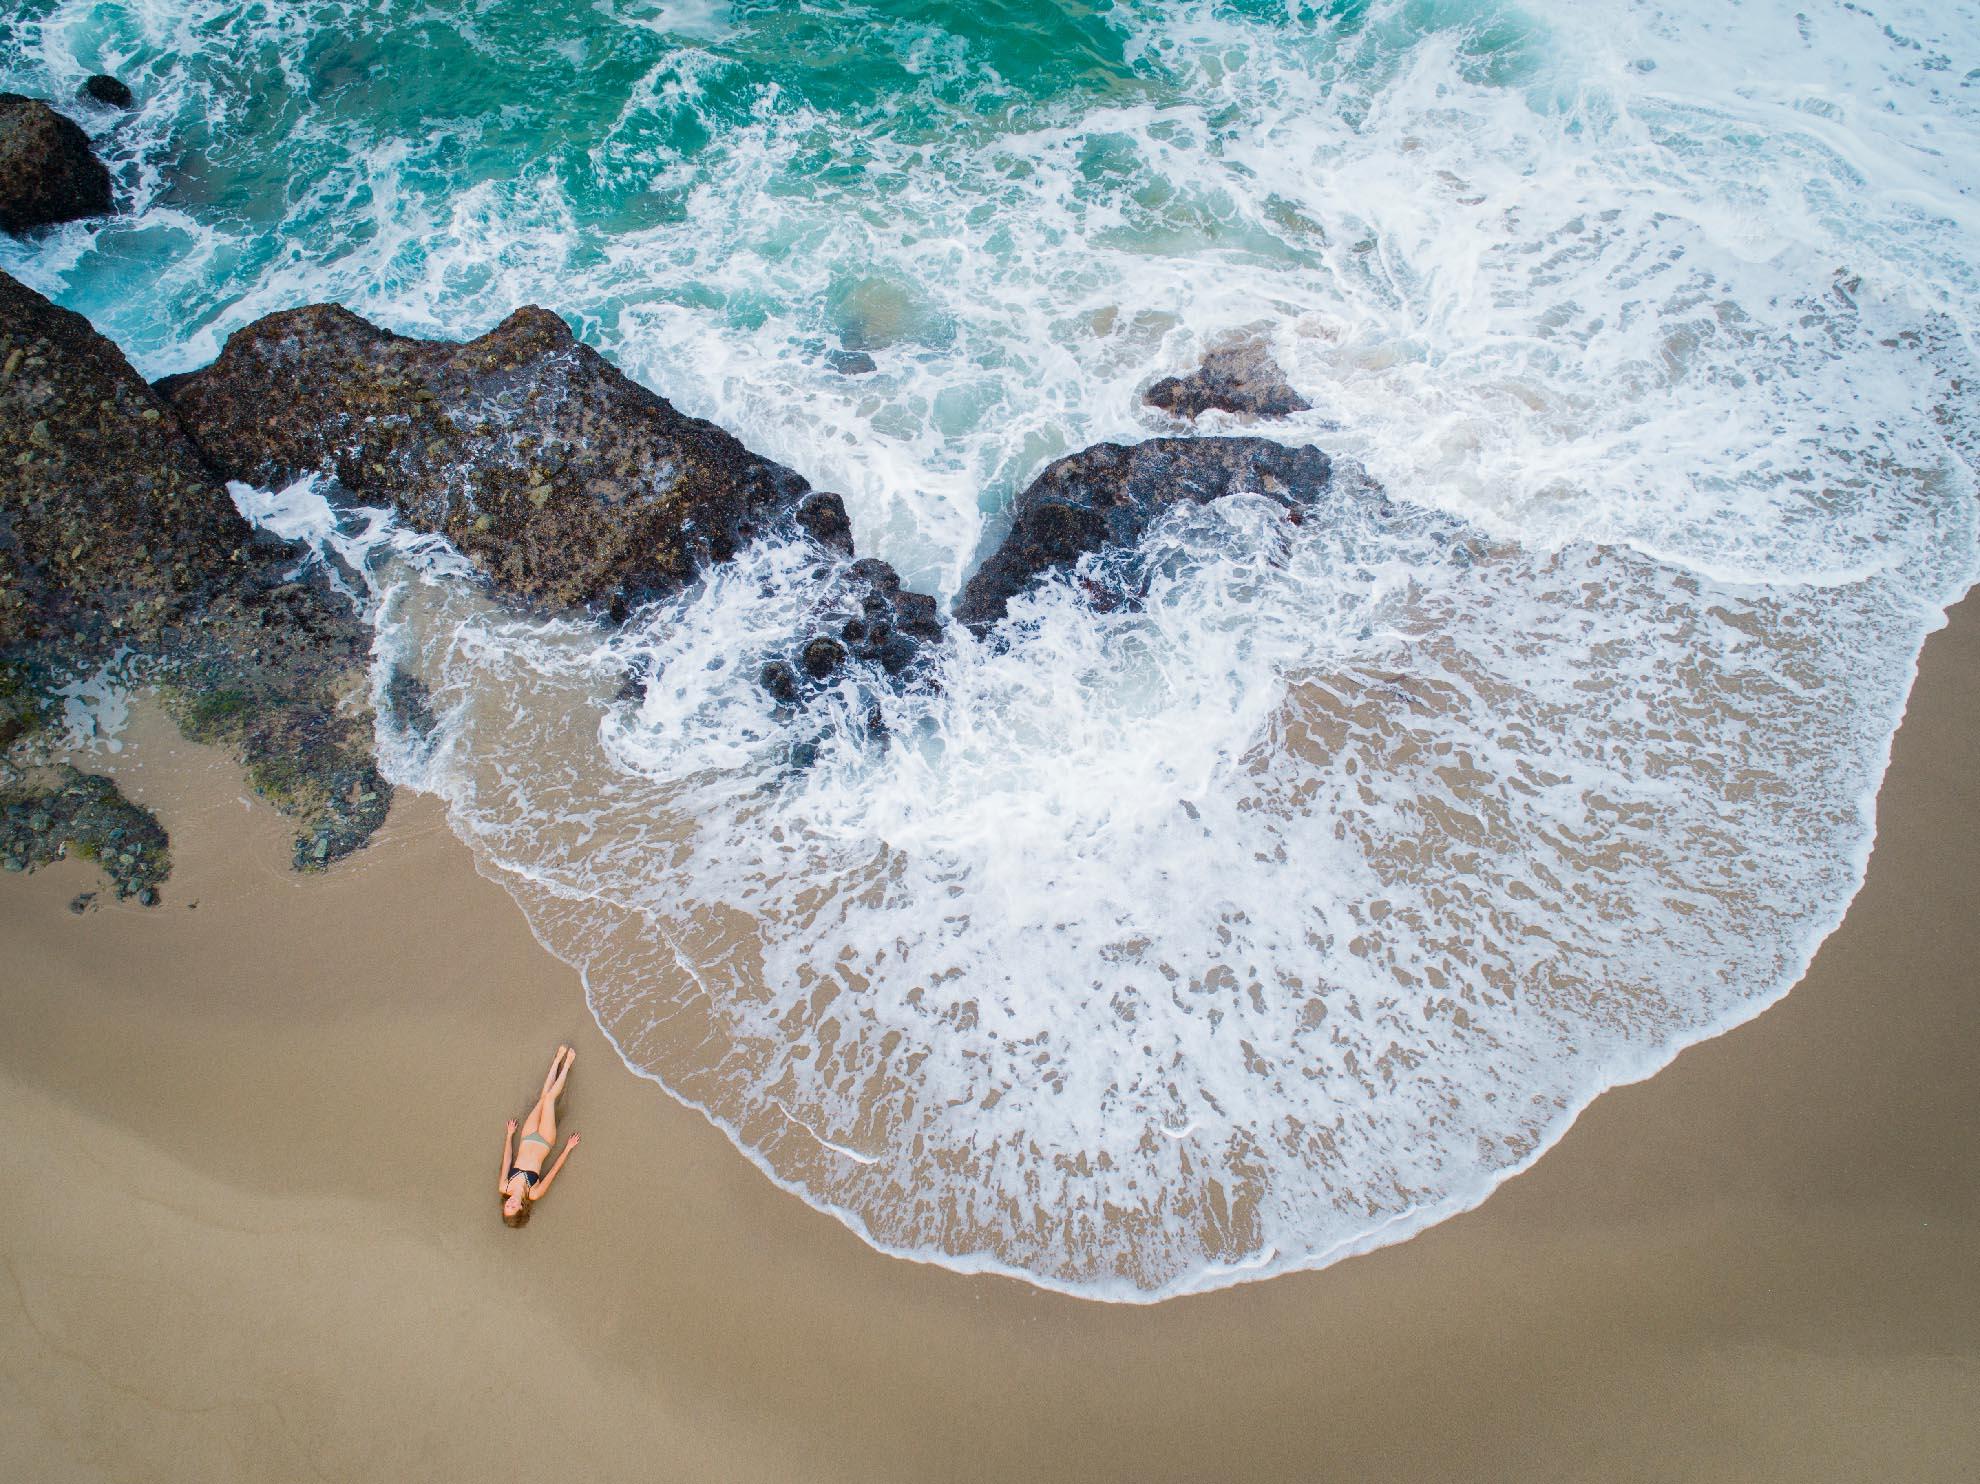 Drone Photograph of birds eye view of woman lying on Table Rock beach California in a bikini